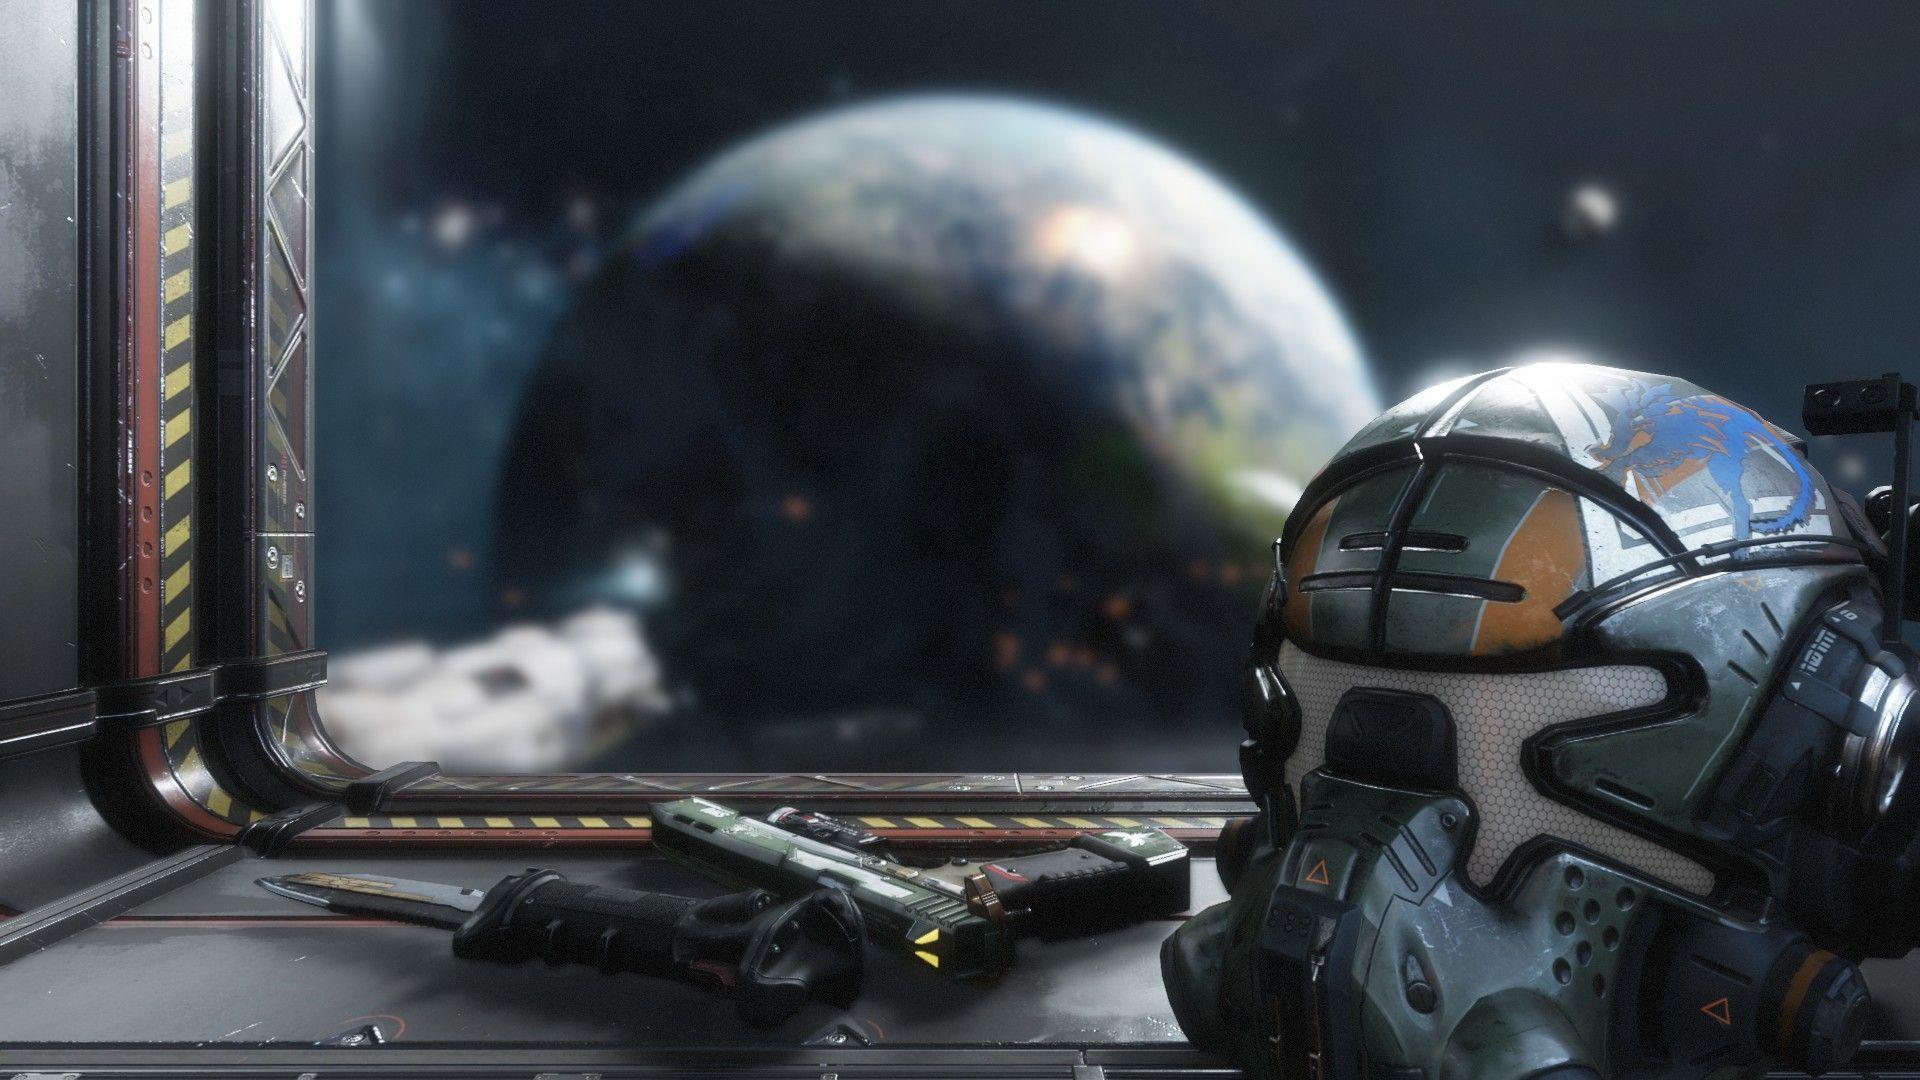 Titanfall Gaming Ultra HD Wallpapers - Top Free Titanfall ...